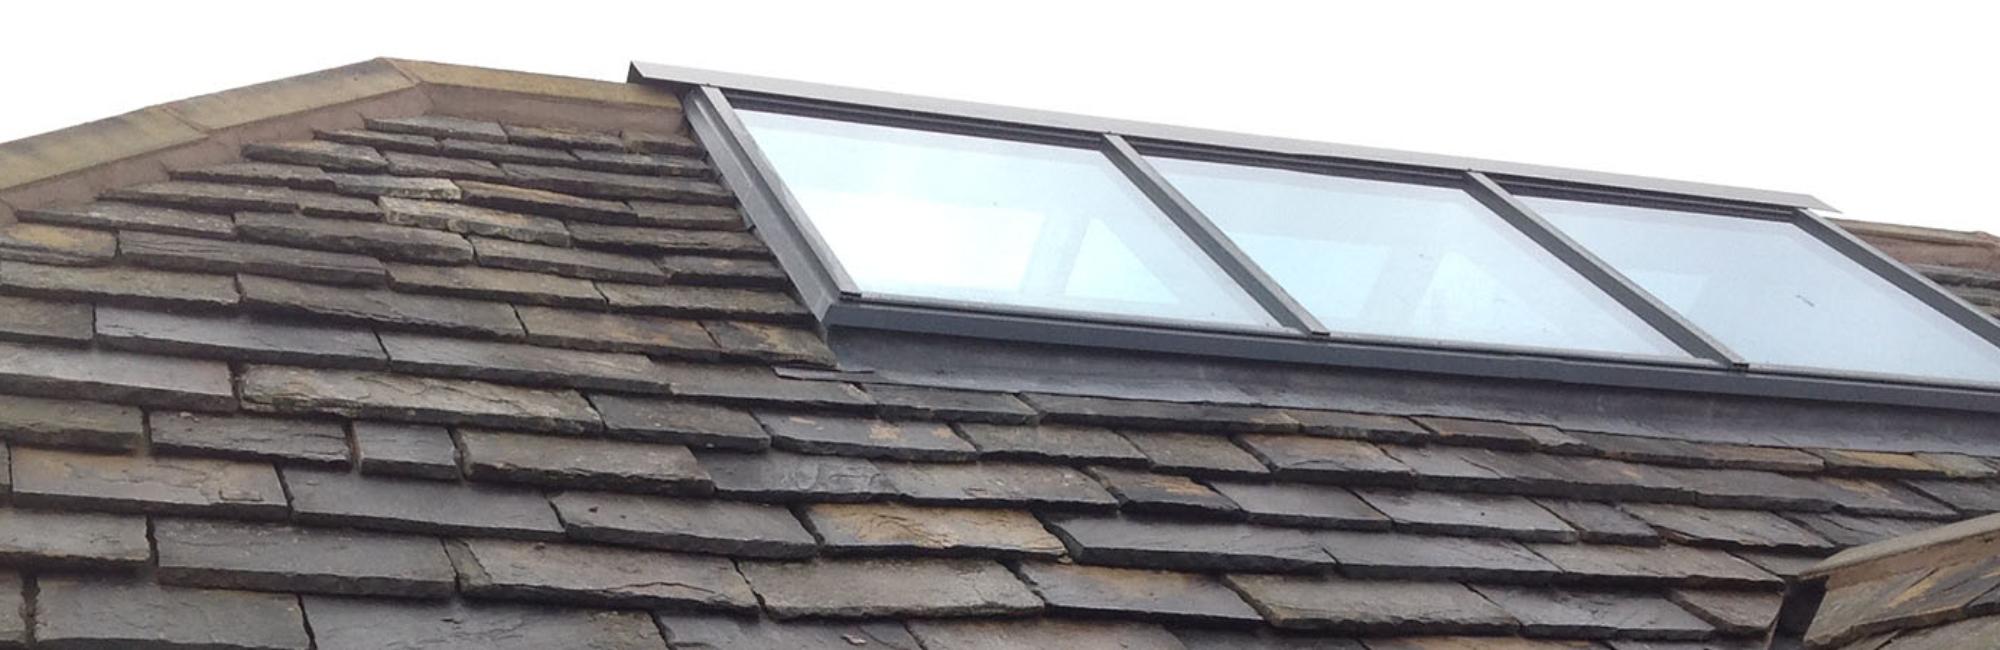 velux roof windows, roof windows